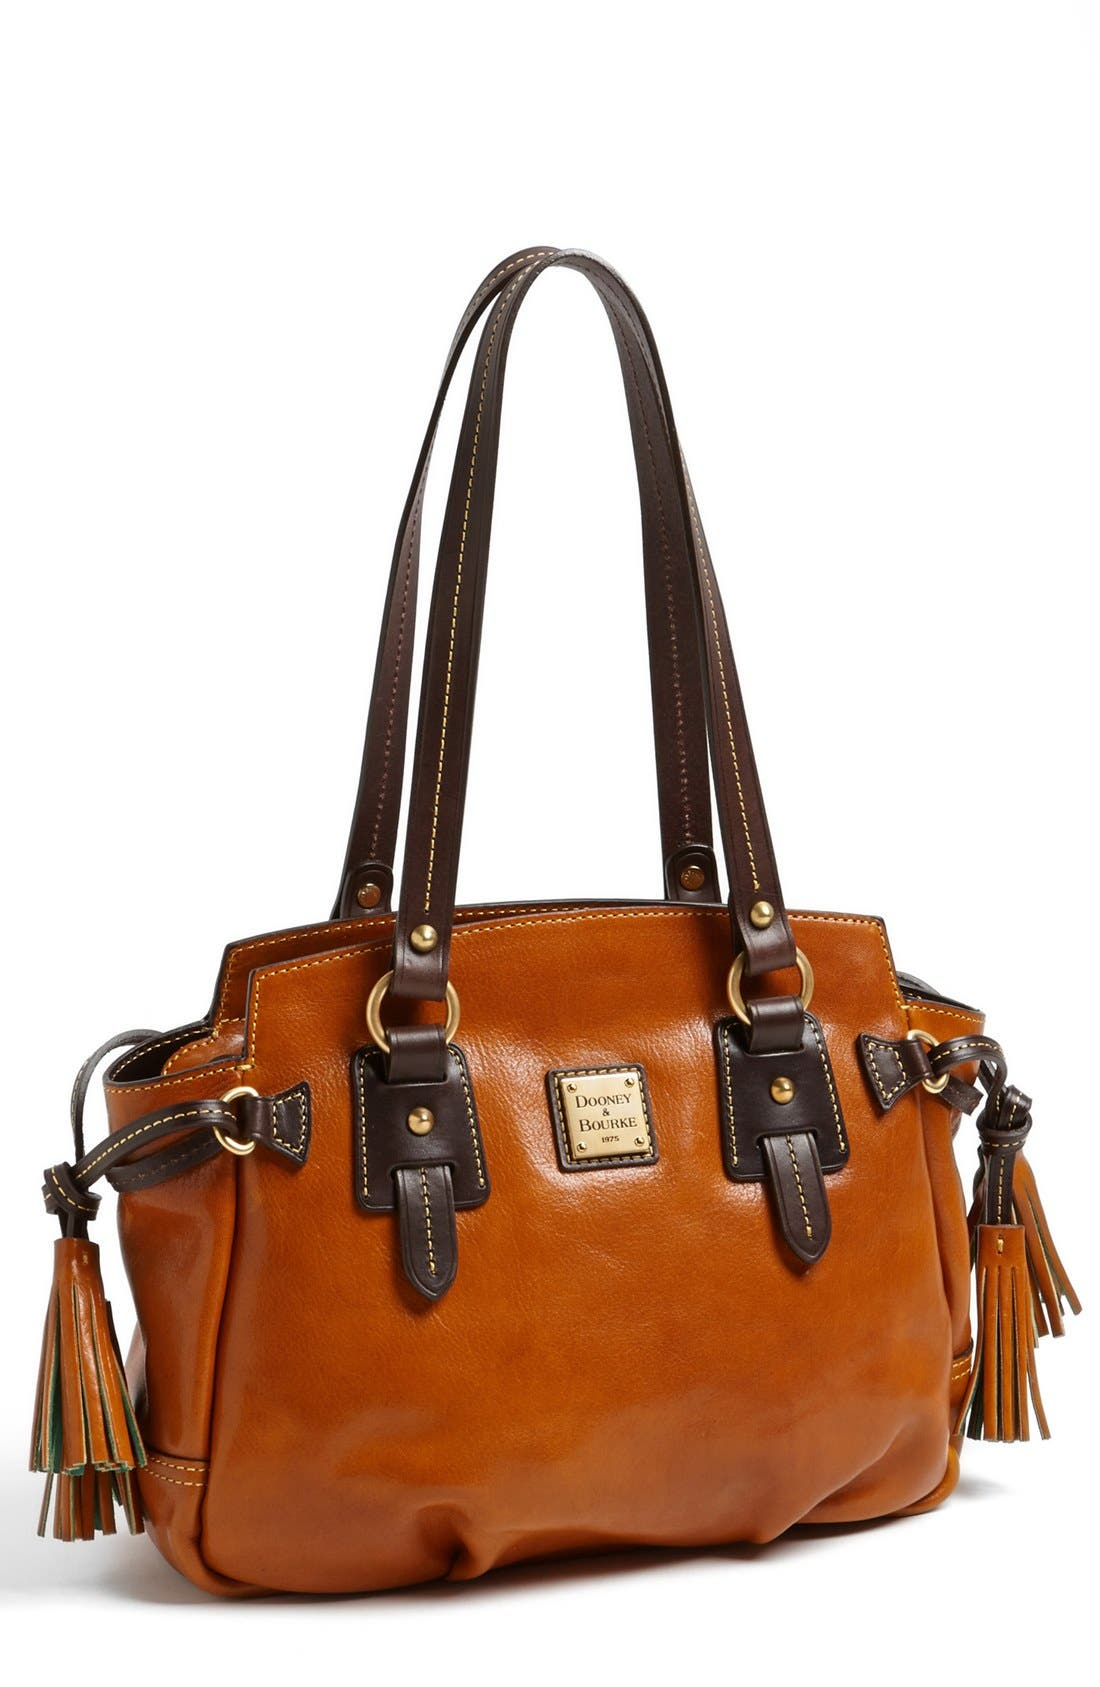 Main Image - Dooney & Bourke 'Winged - Small' Leather Handbag